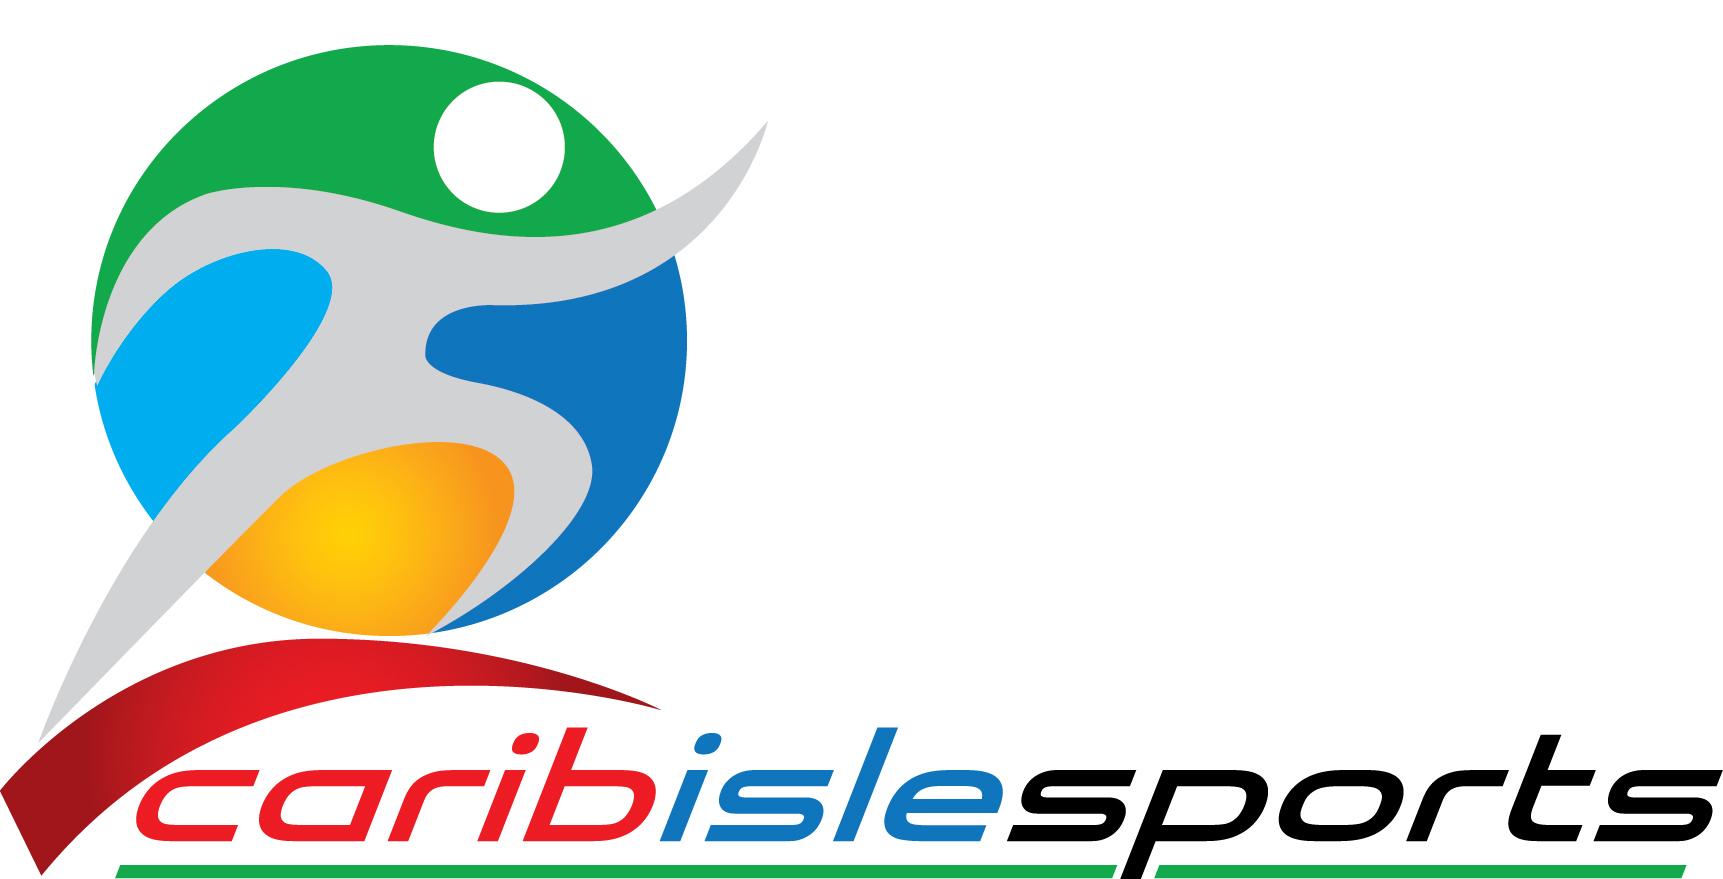 caribislesports.com